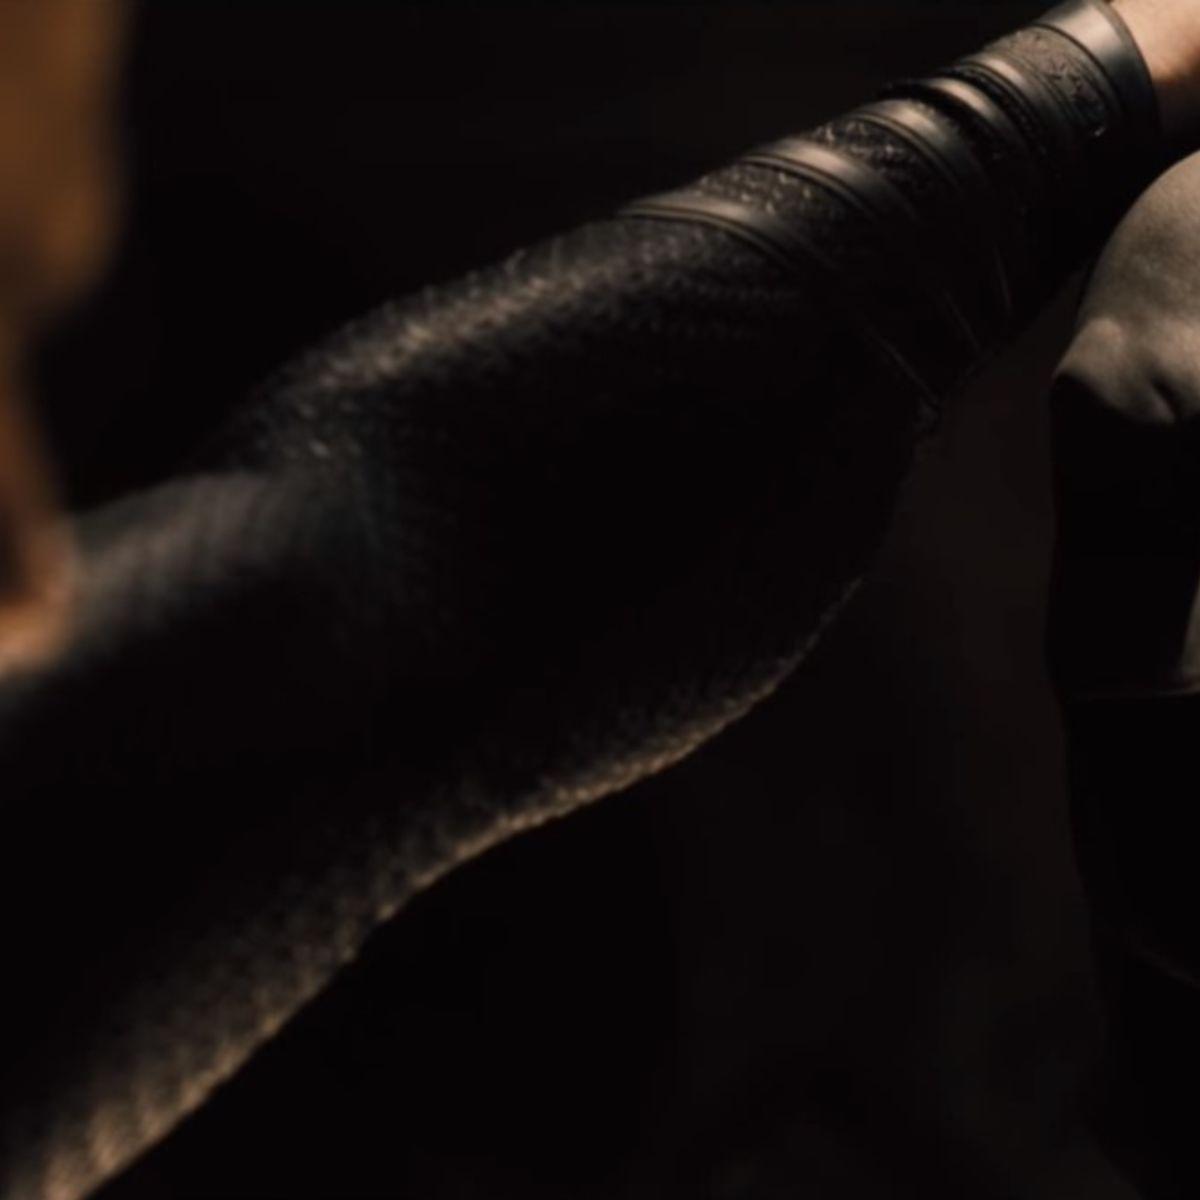 BatmanvSuperman-Sneak-Peek-screenshot_1.jpg